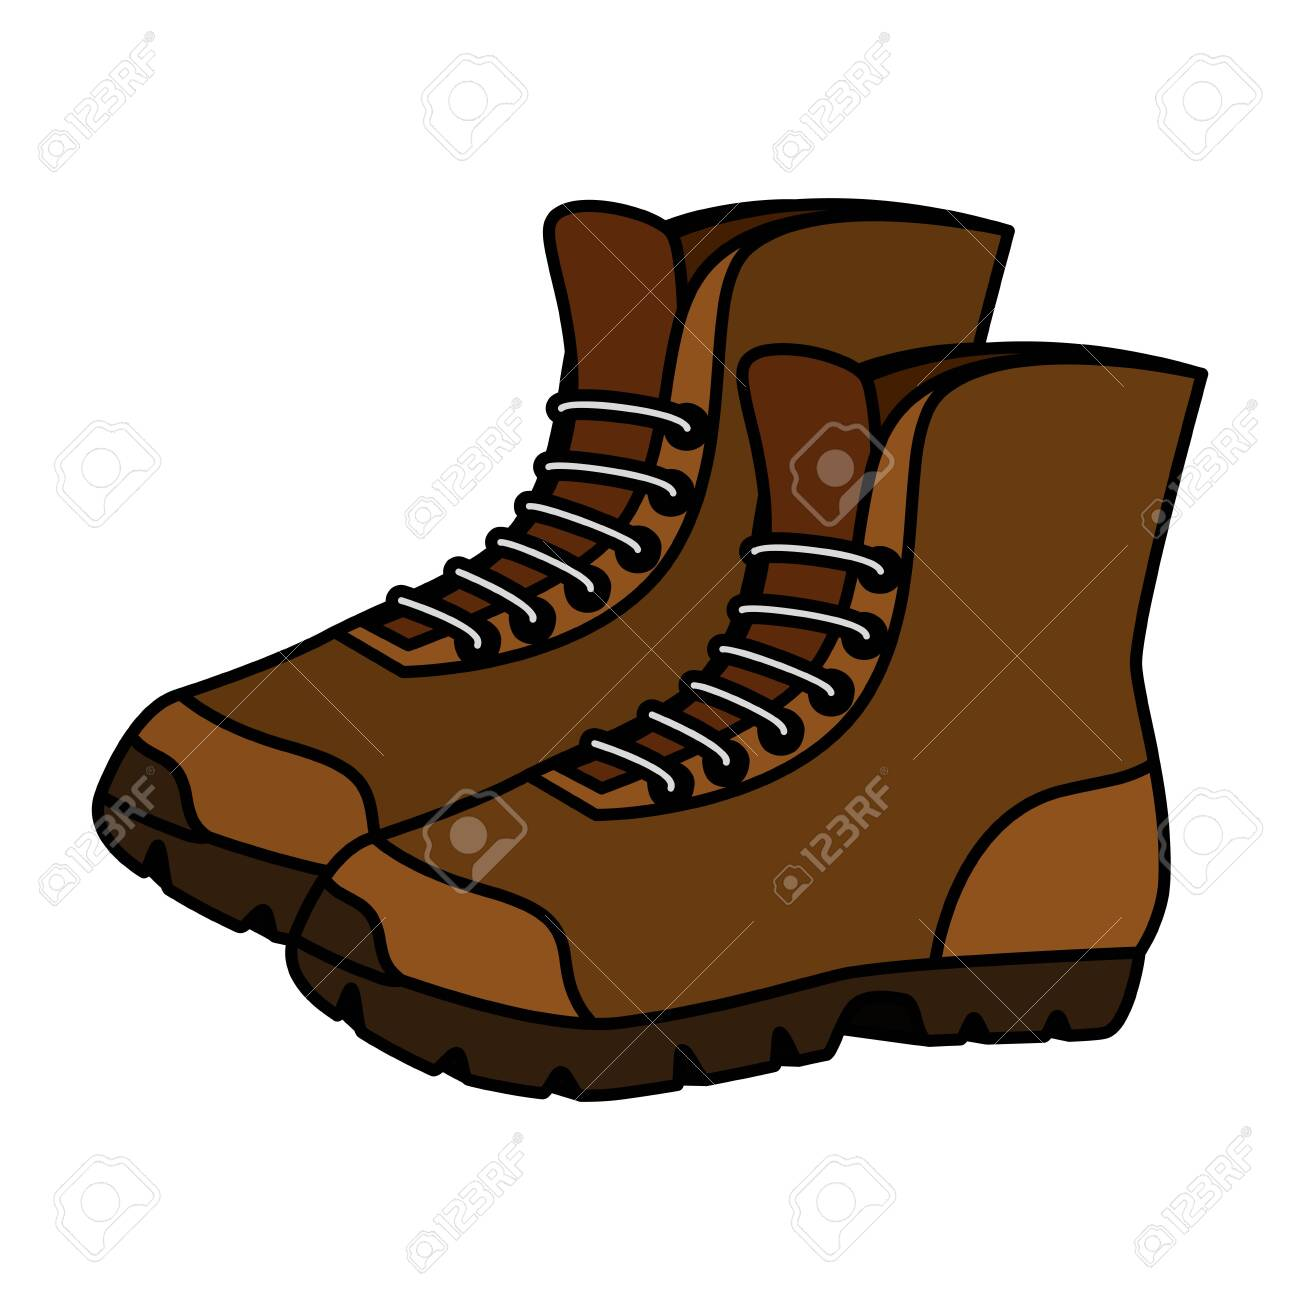 boots shoes adventure accessory icon vector illustration design - 129367081